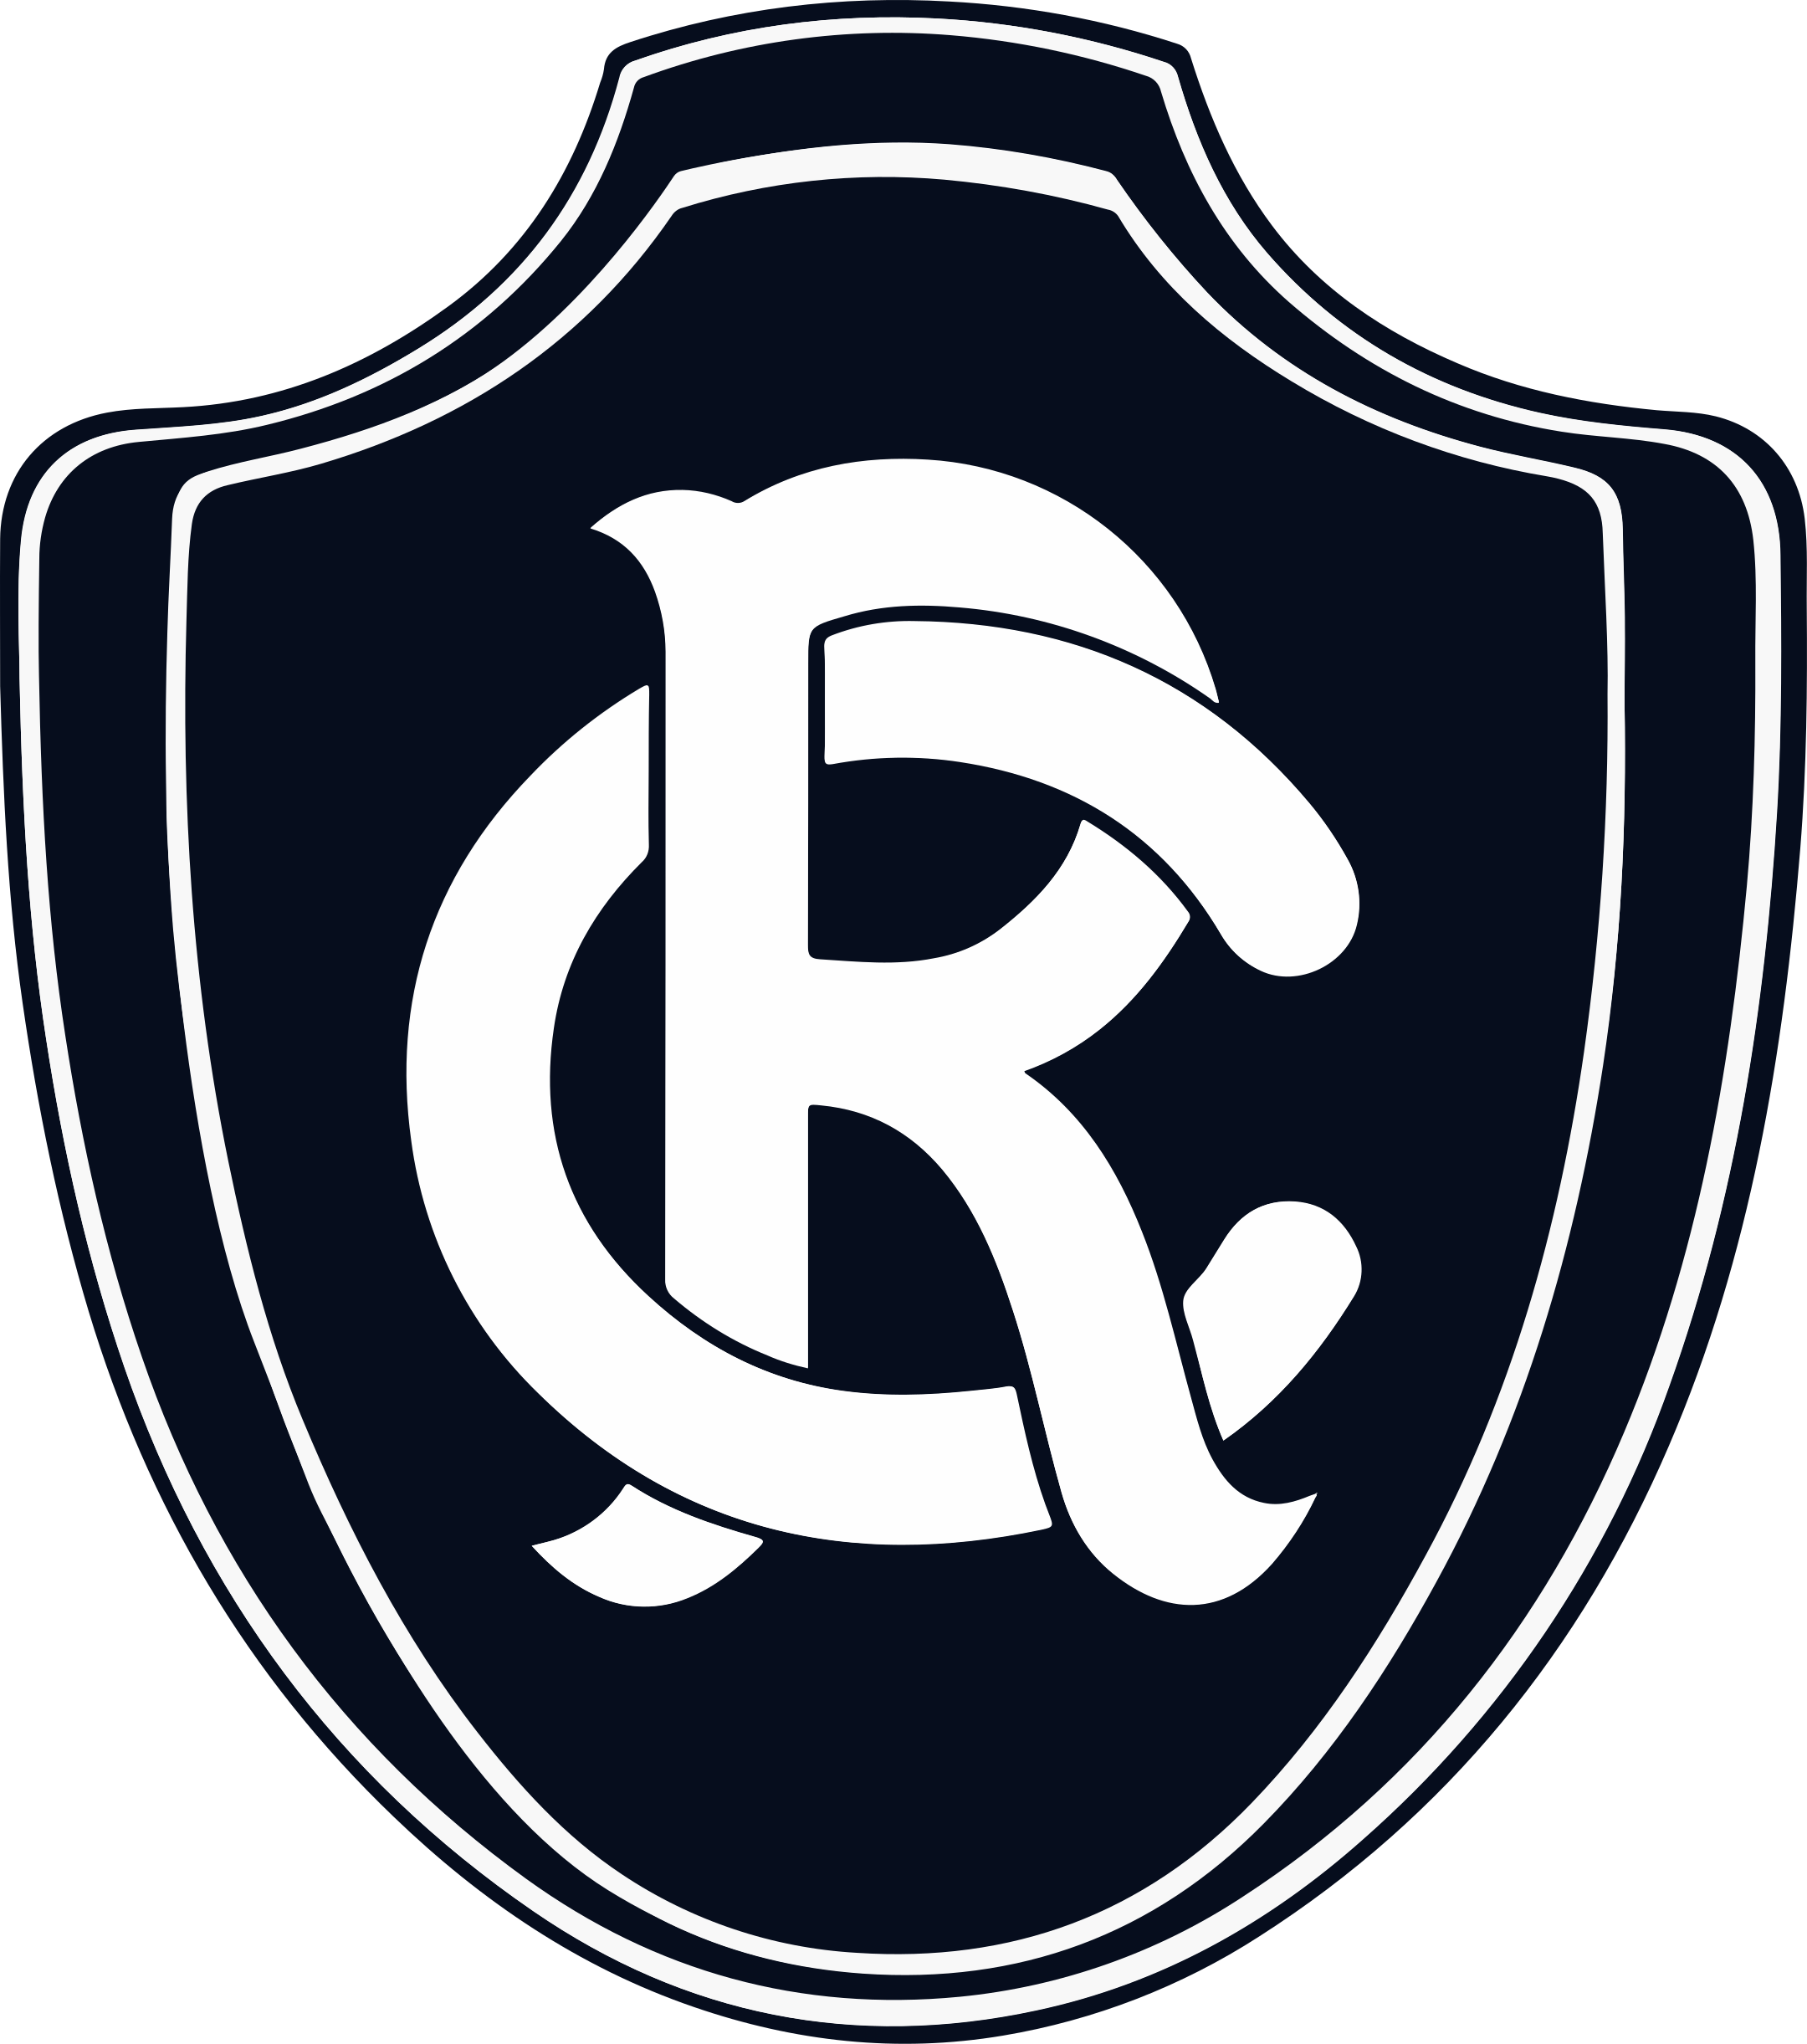 remo logo 1 1 - Remo Logo